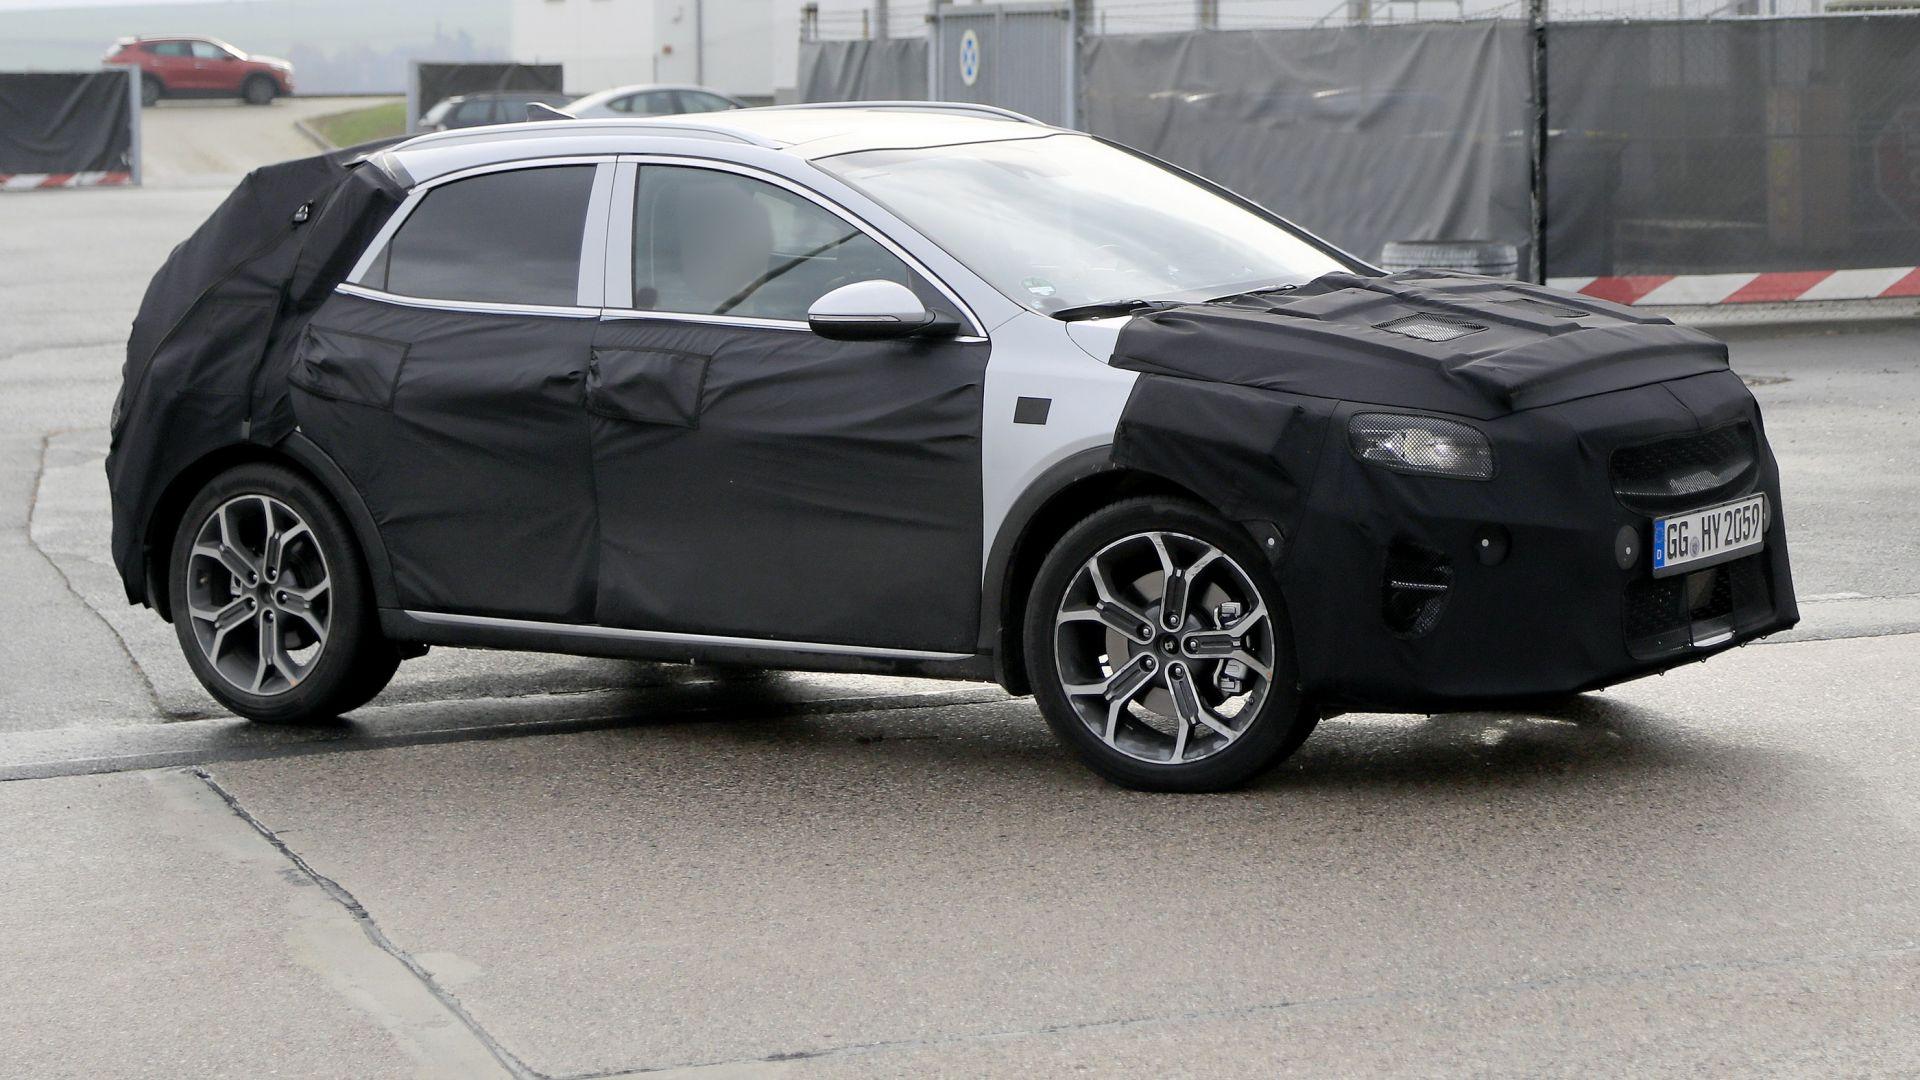 Nuovo SUV Kia 2019: Ceed o XCeed dopo ProCeed e Ceed Station Wagon - MotorBox